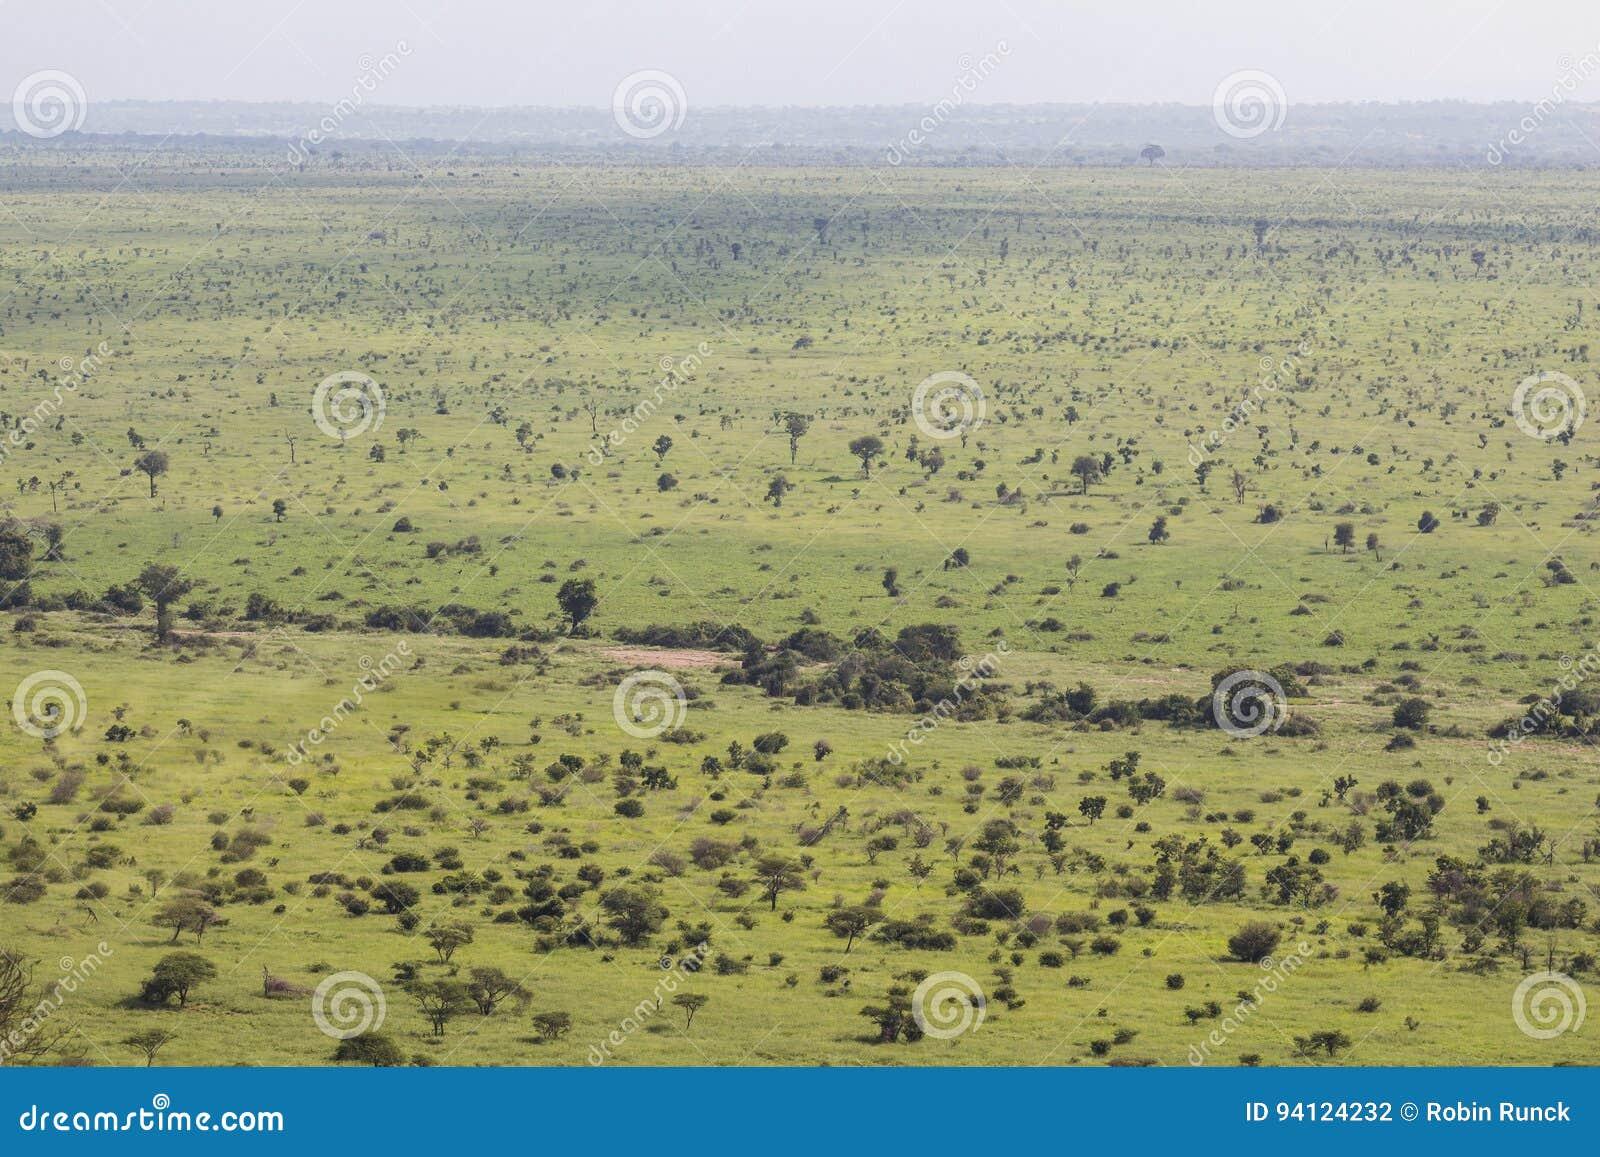 Wide and green landscape view of Kruger National Park